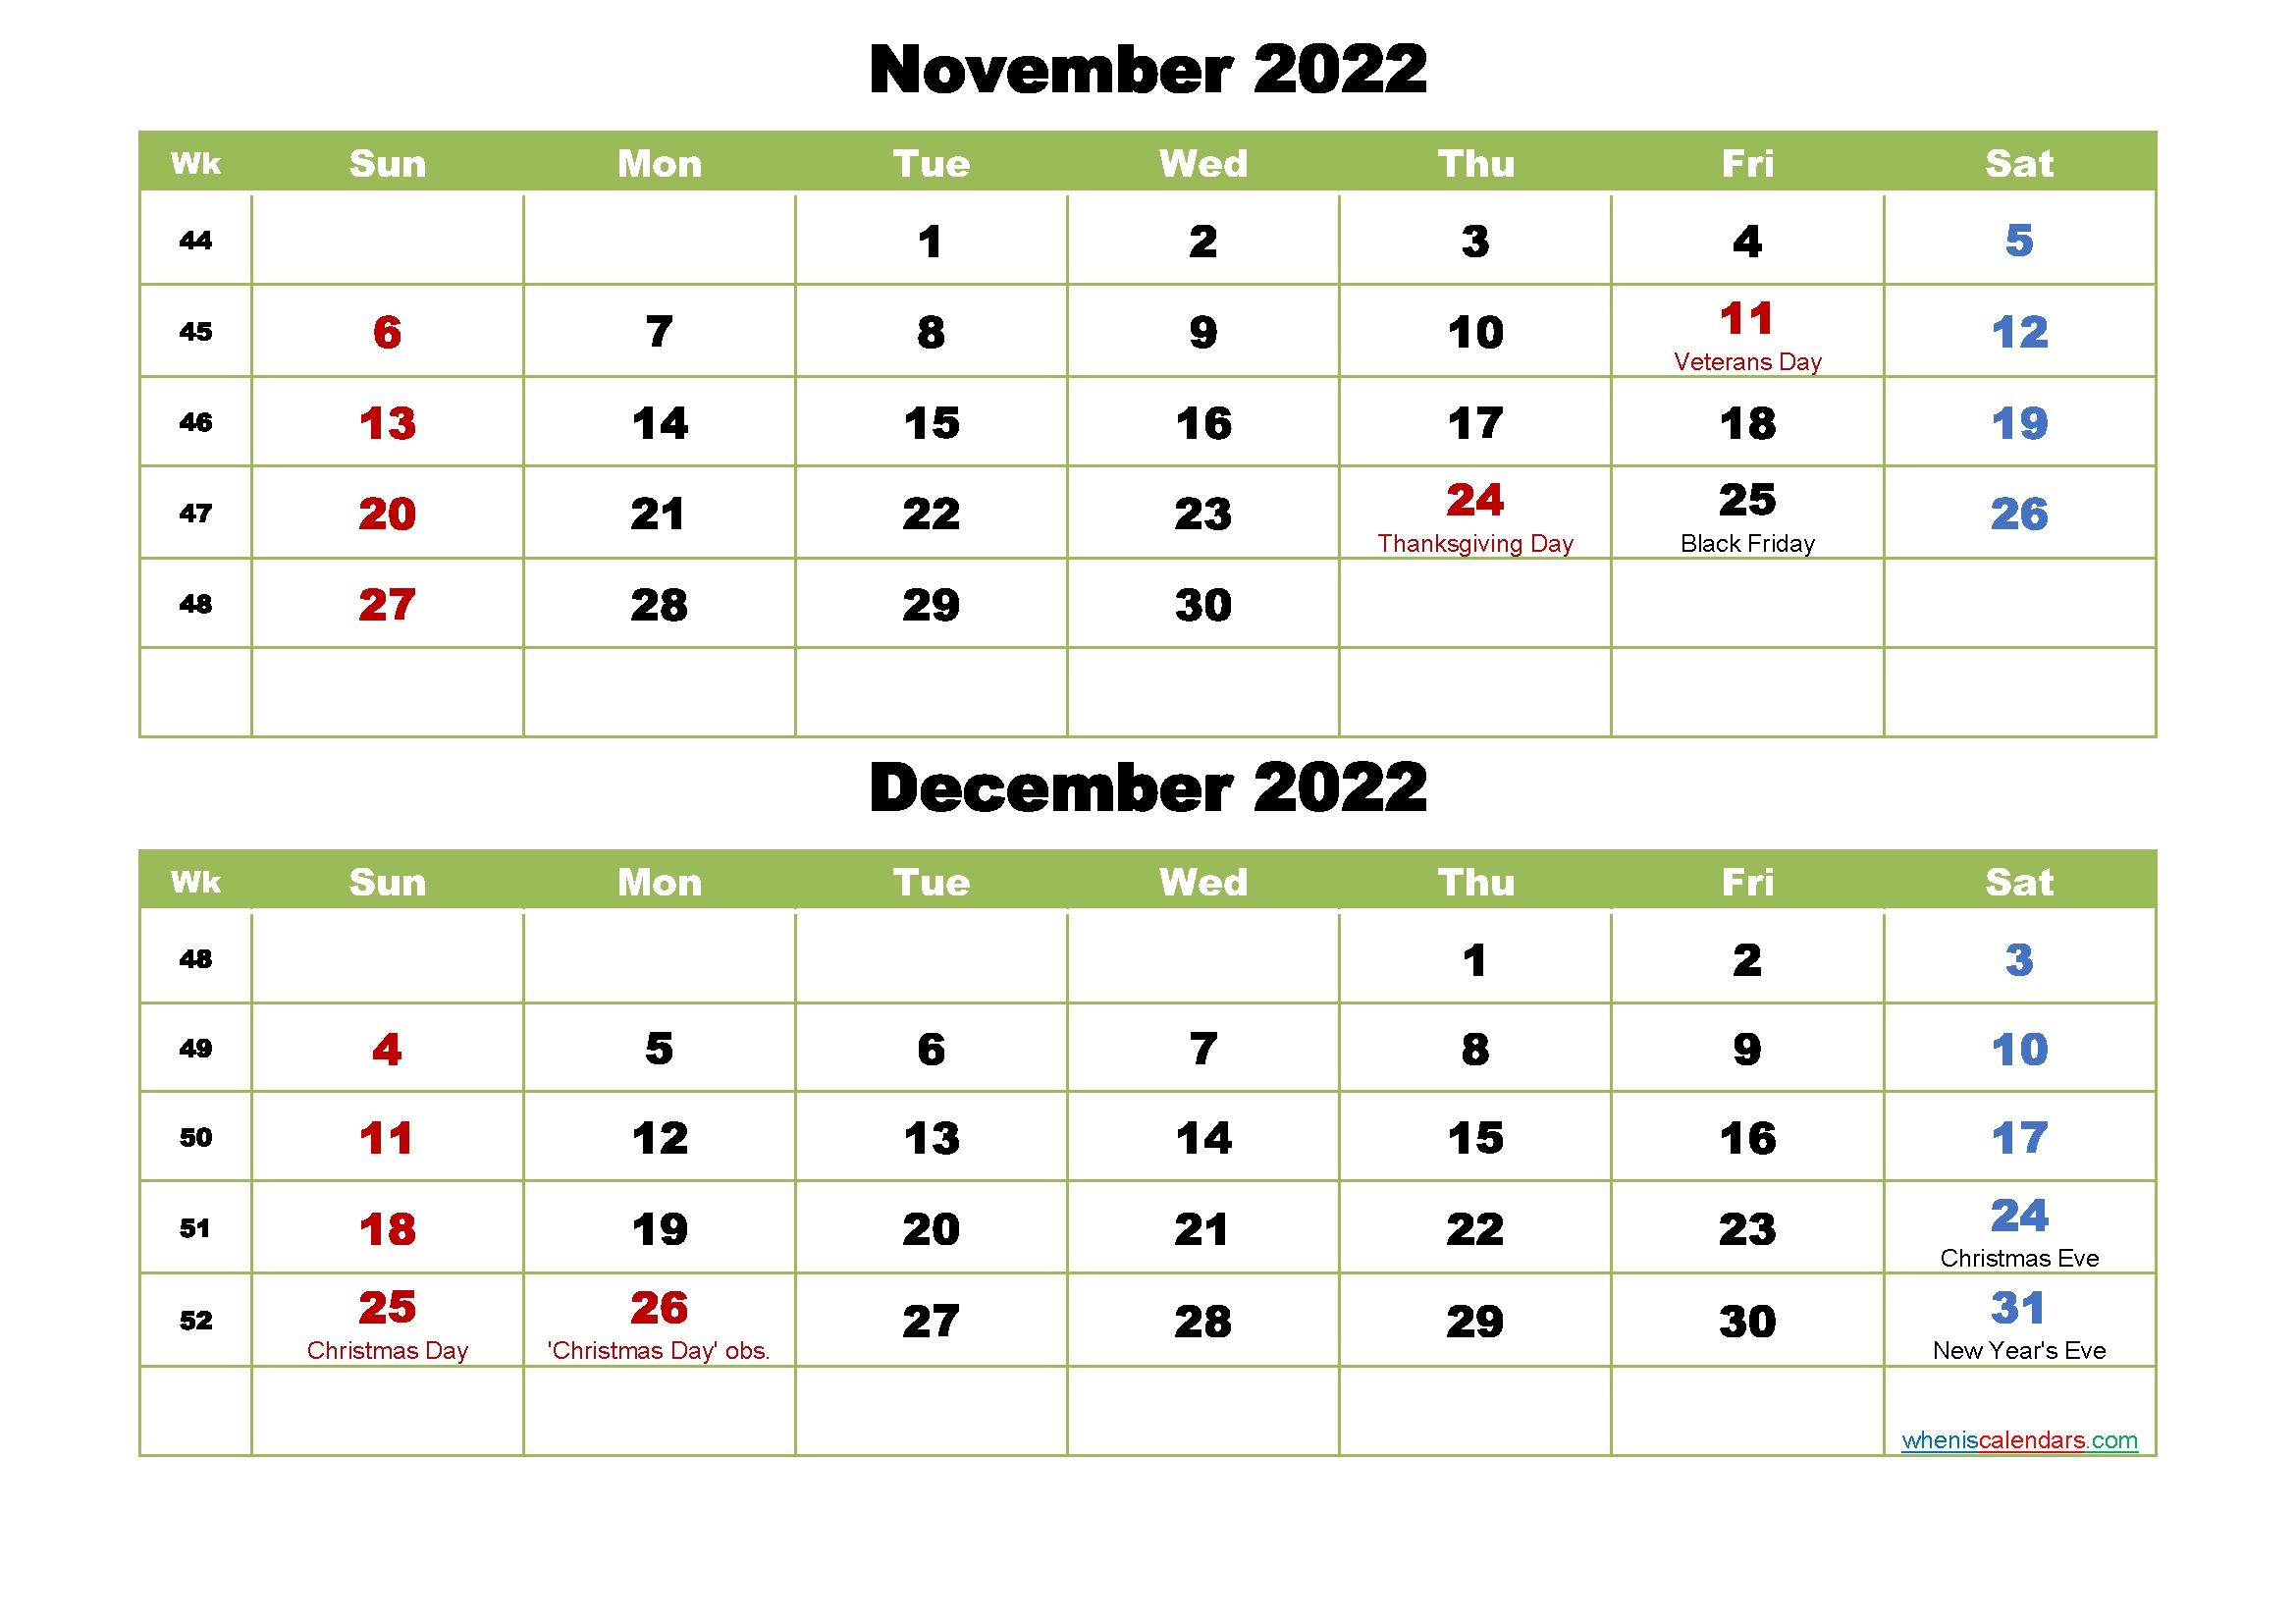 November And December 2022 Calendar With Holidays - Free Printable 2021 Monthly Calendar With December 2021 And January 2022 Calendar